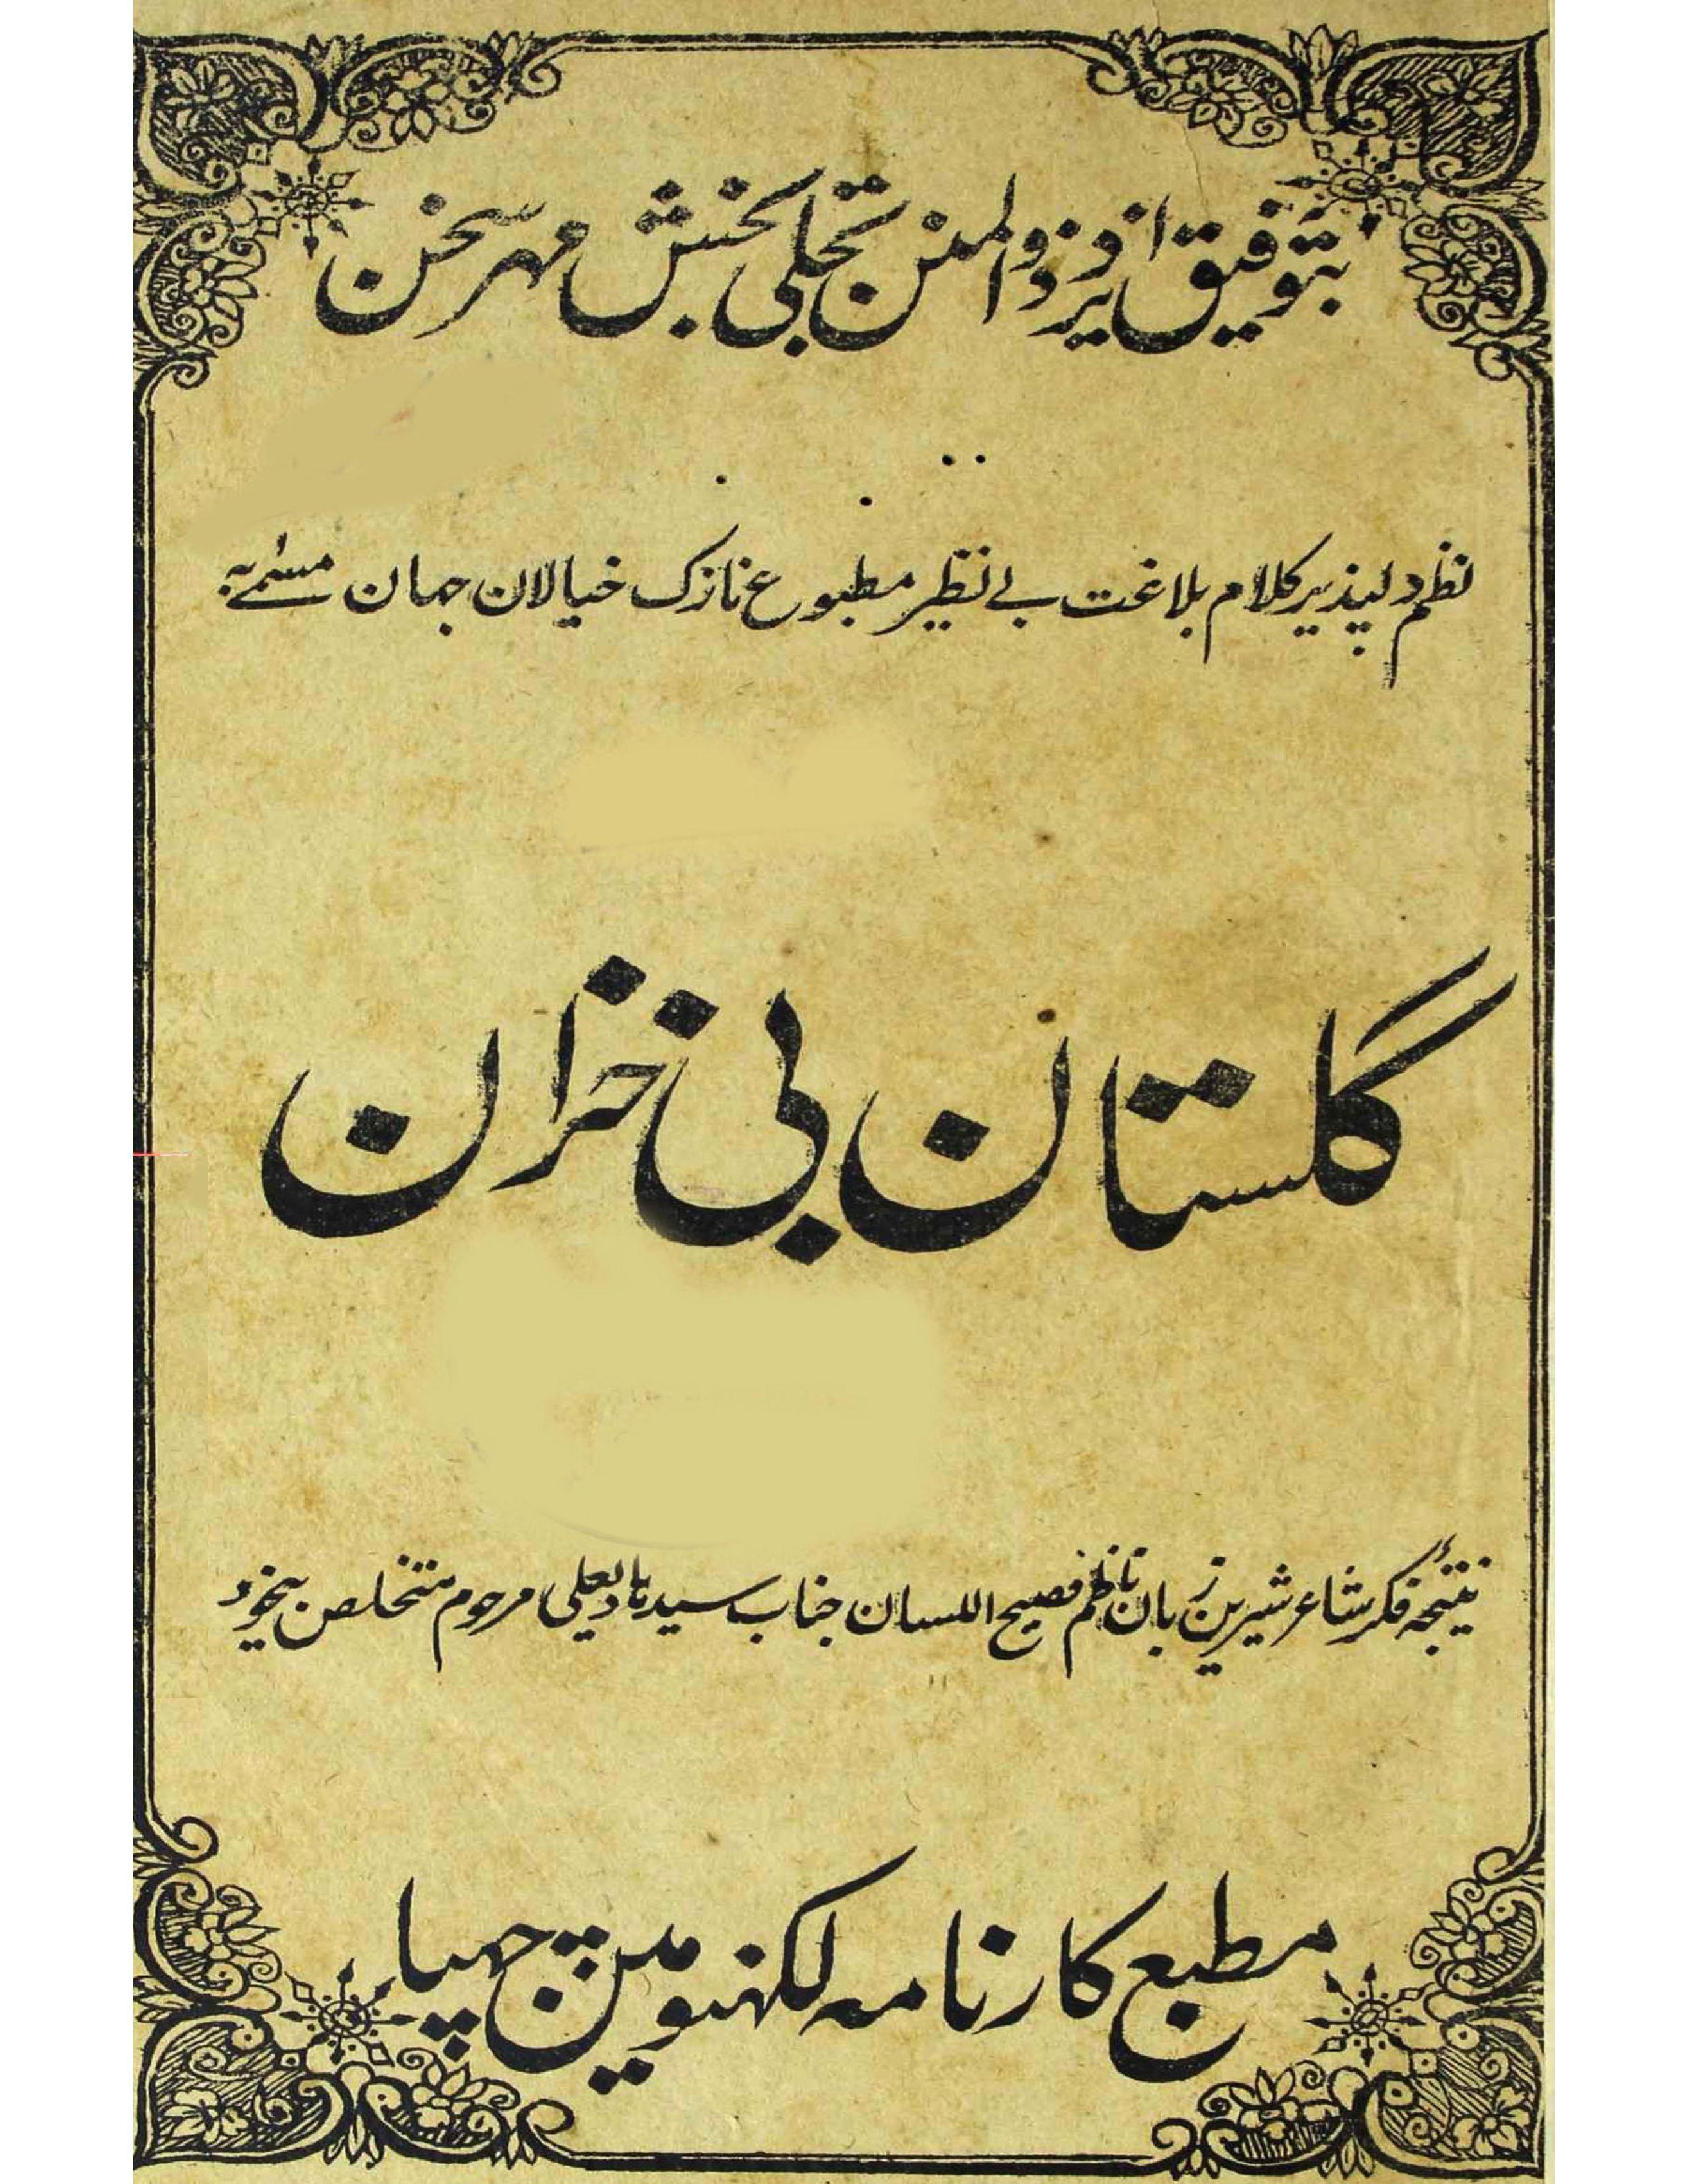 Gulistan-e-Be-Khazan